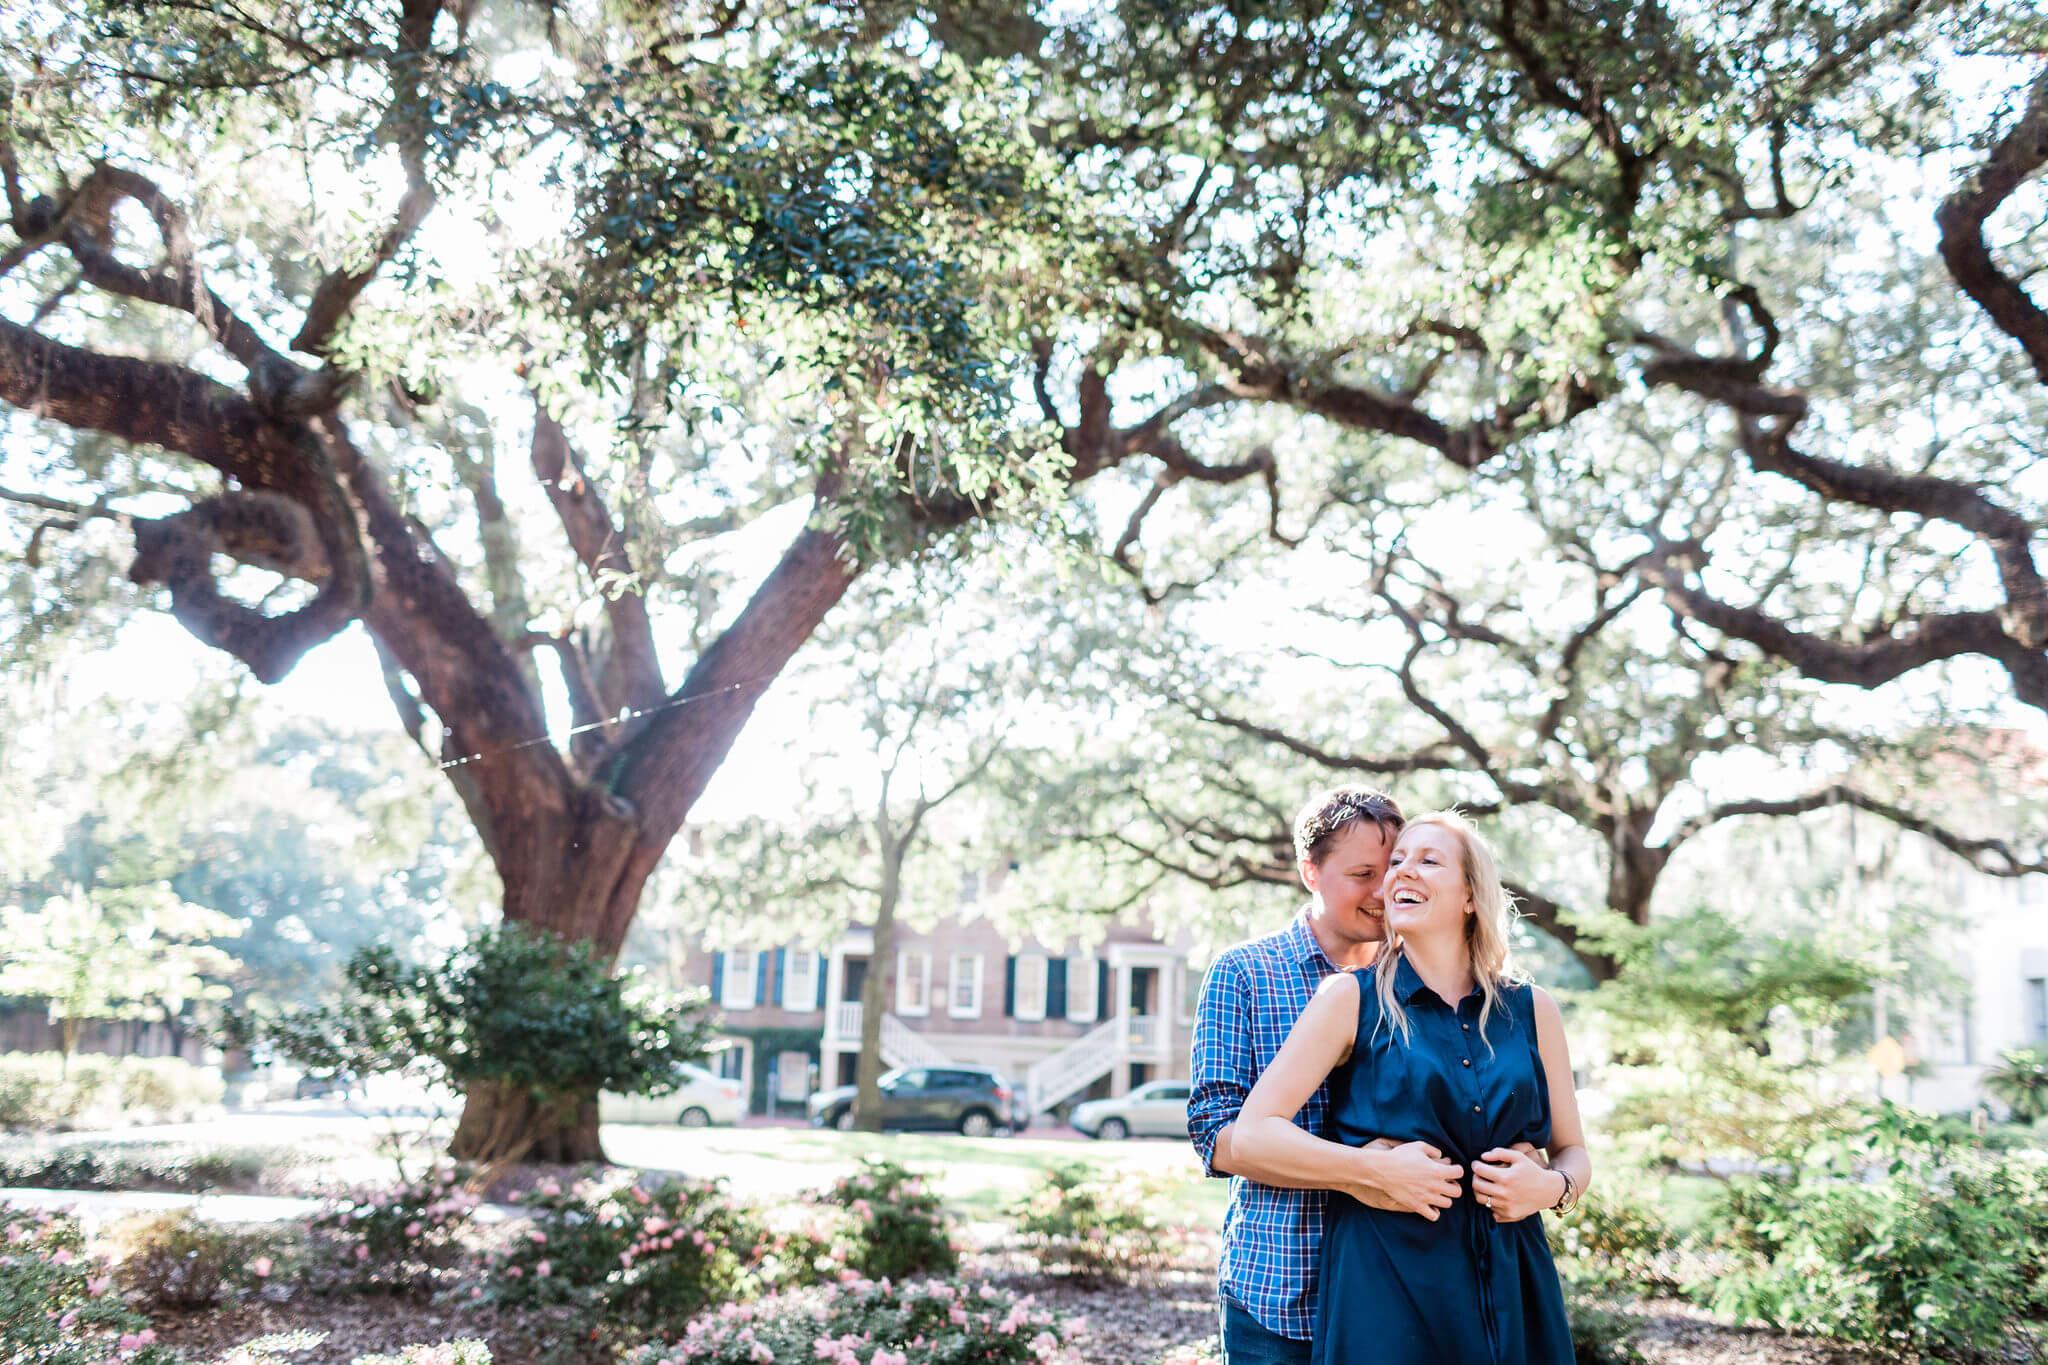 Apt-b-photography-savannah-engagement-photographer-savannah-wedding-hilton-head-elopement-savannah-wedding-photographer-14.jpg